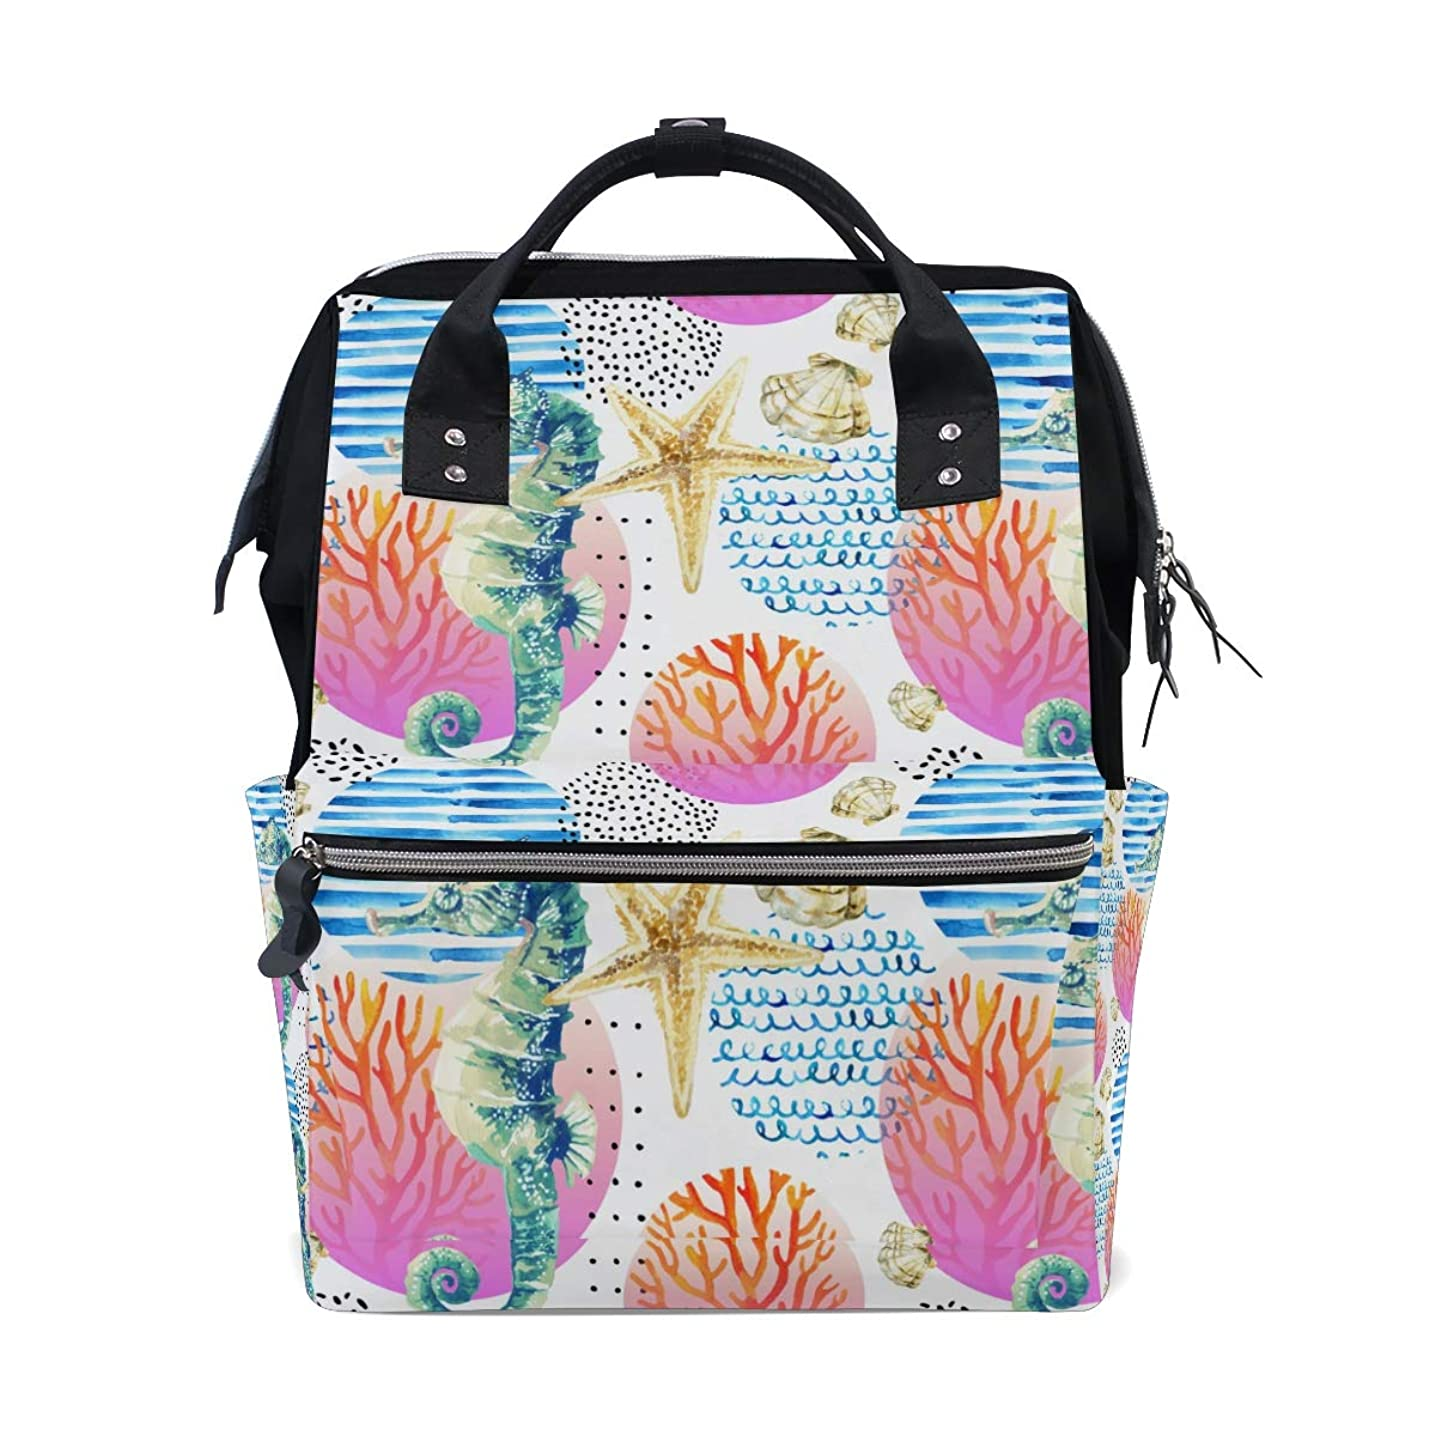 Watercolor Seahorse Seastars School Backpack Large Capacity Mummy Bags Laptop Handbag Casual Travel Rucksack Satchel For Women Men Adult Teen Children